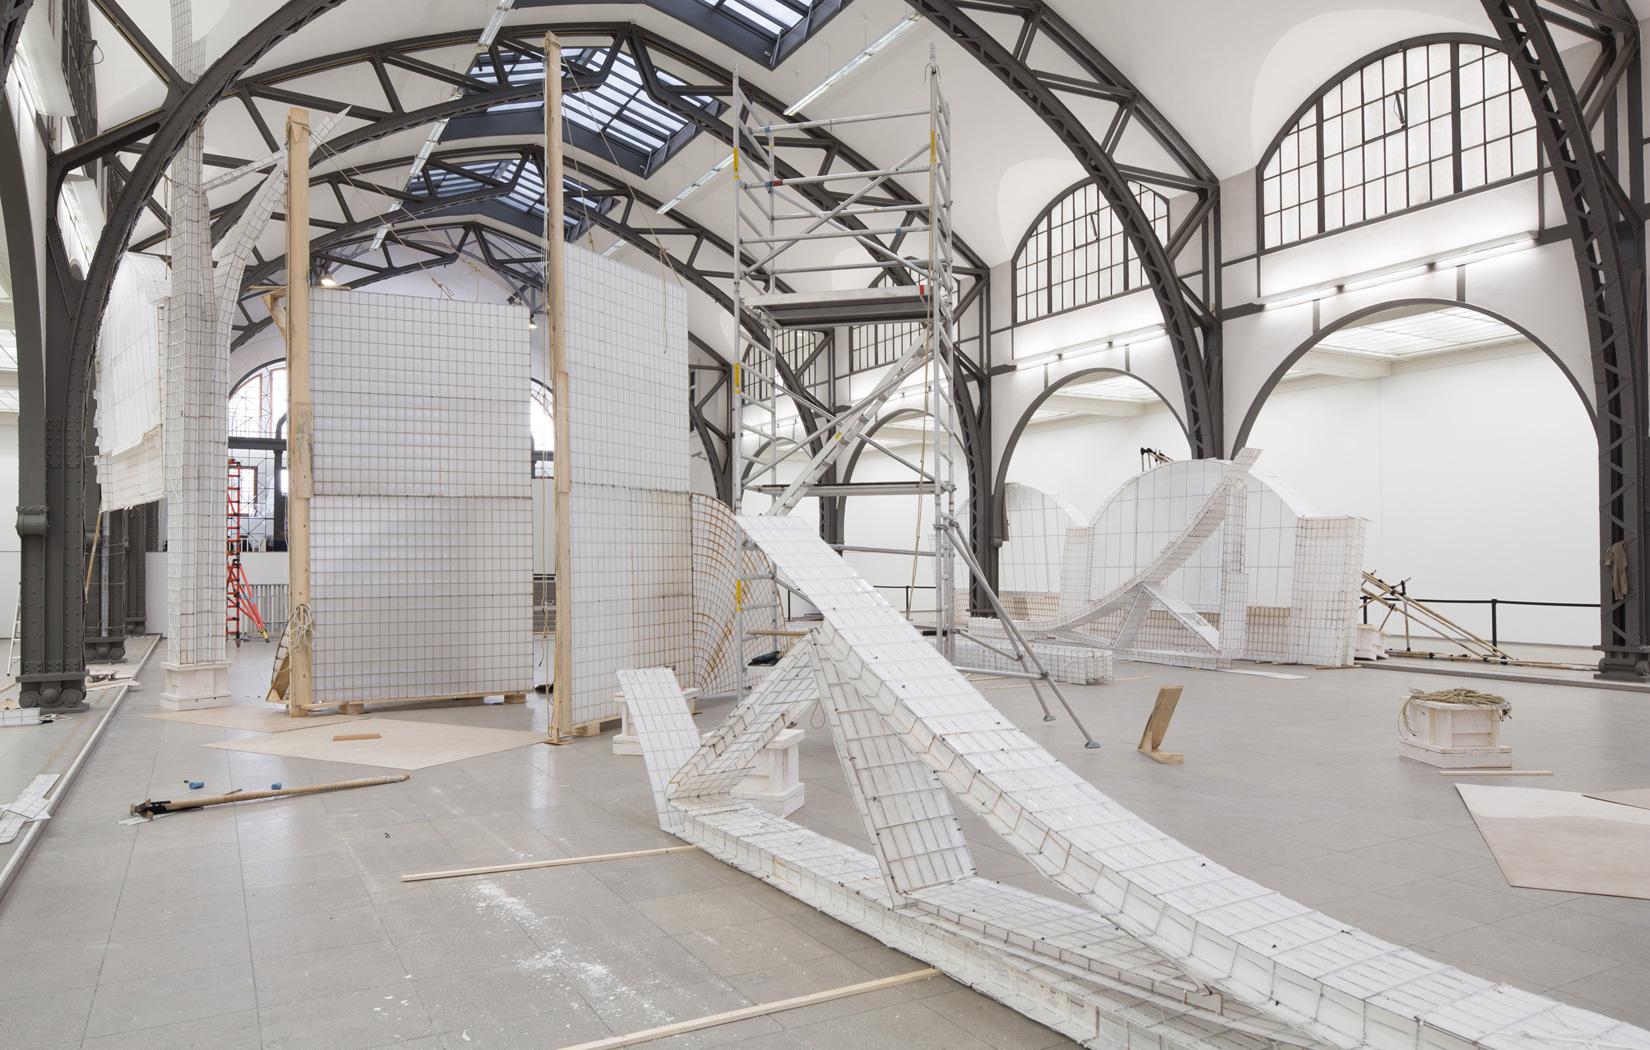 Hamburger-Michael-Beutler--Moby-Dick,-2015.-Ansicht-Ausstellungsaufbau-(Exhibition-setup-at)-Hamburger-Bahnhof---Museum-für-Gegenwart---Berlin